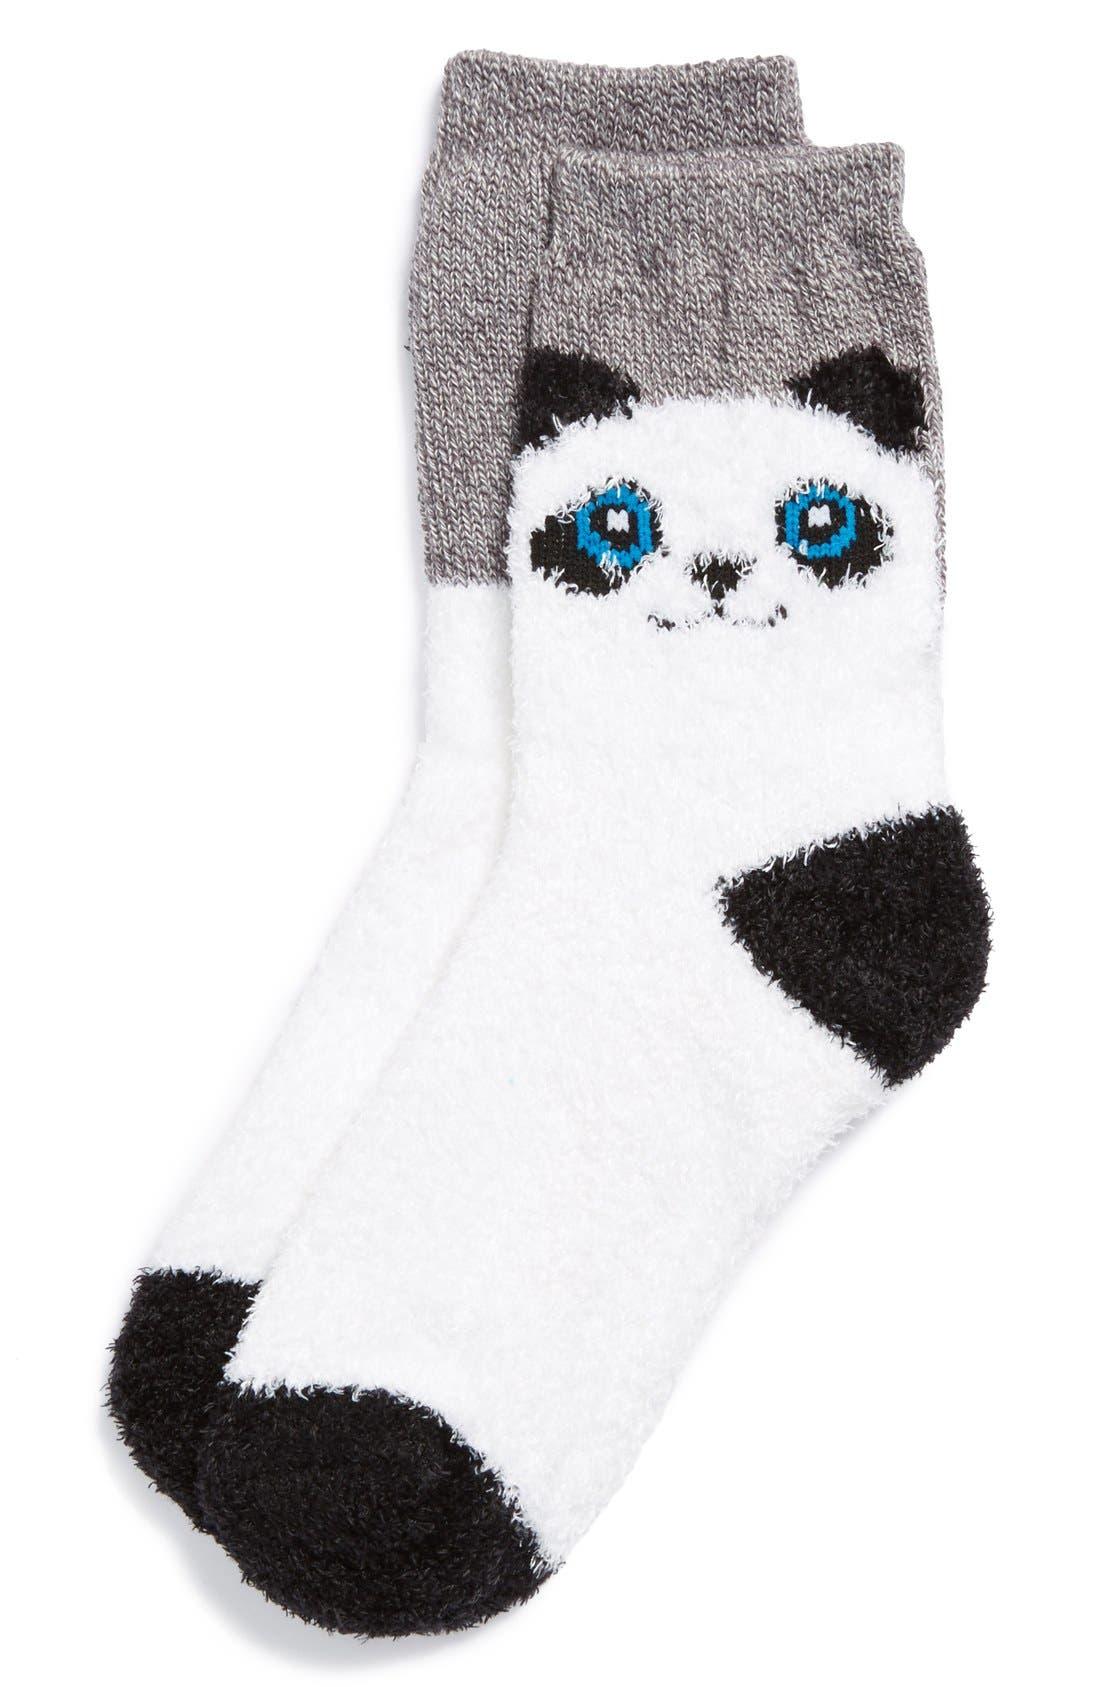 Alternate Image 1 Selected - Capelli of New York 'Sleepy Panda' Socks (Juniors)